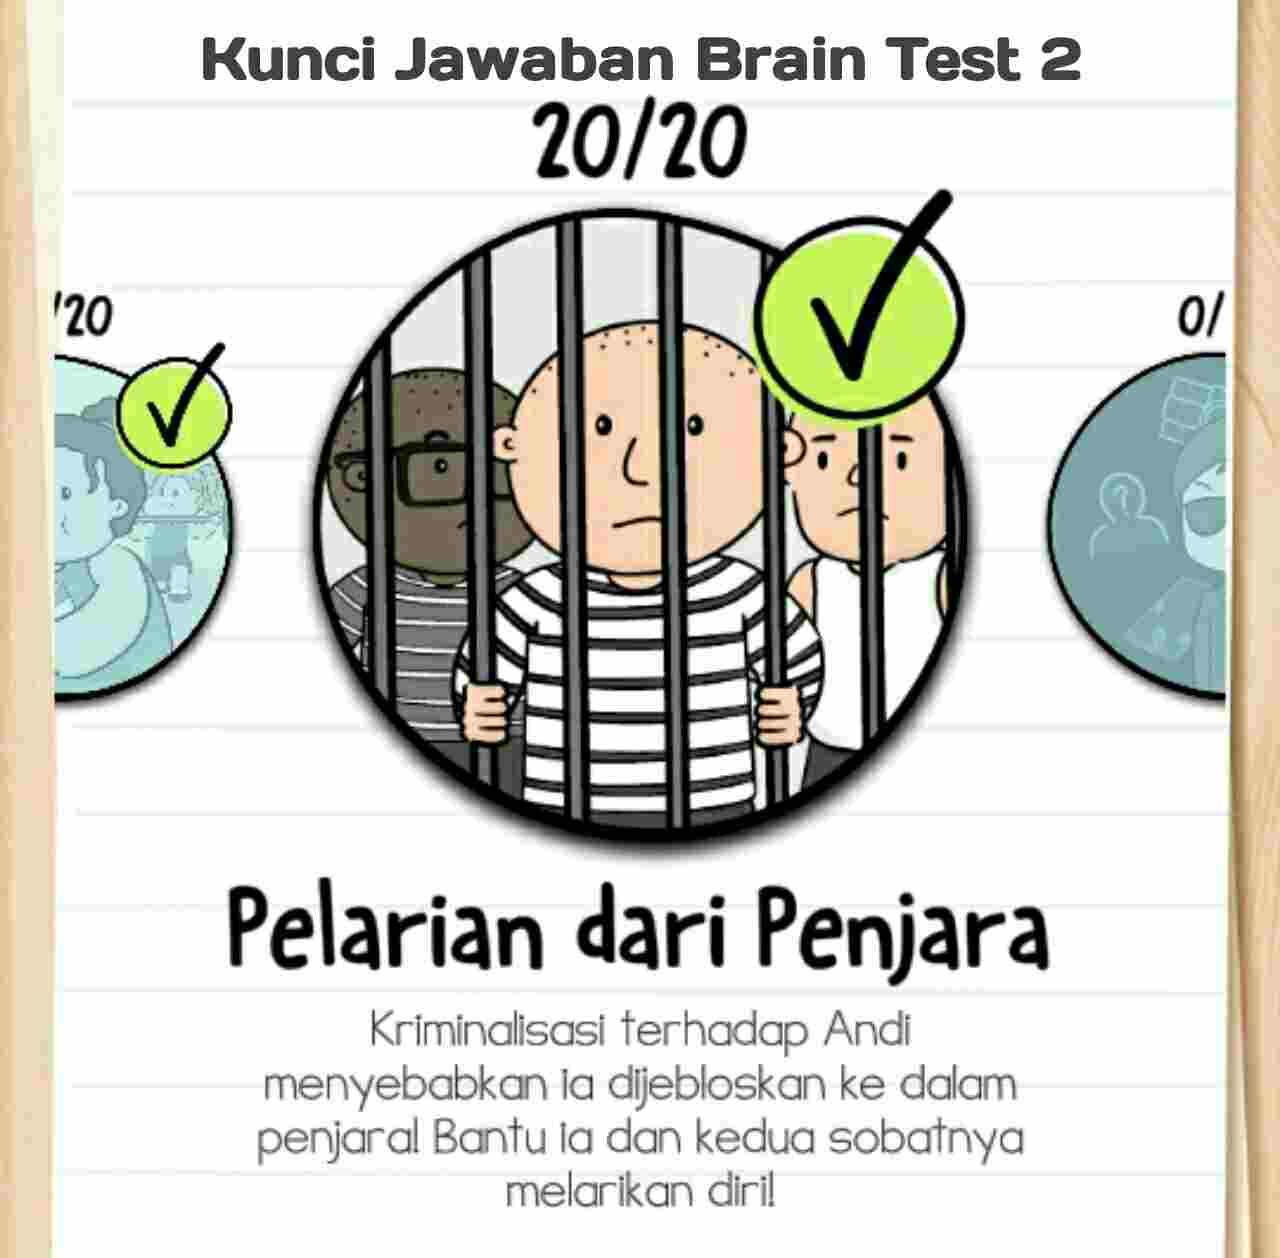 Kunci Jawaban Brain Test 2 Pelarian Dari Penjara Level 1 20